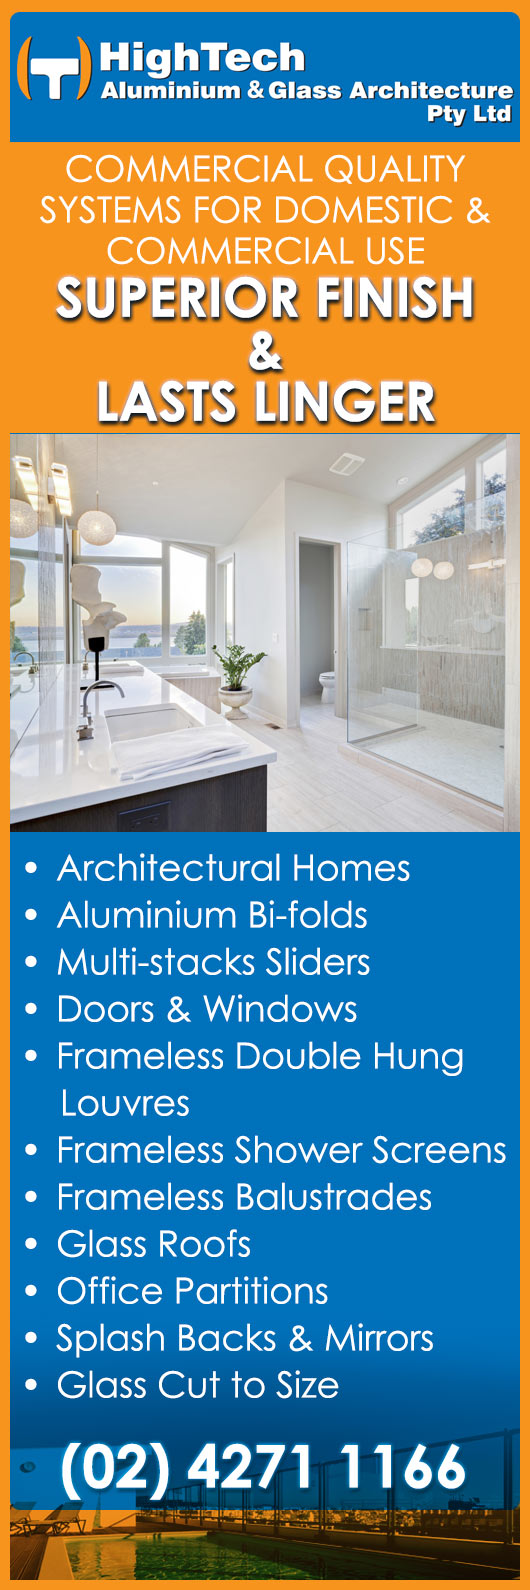 Hightech Aluminium And Glass Architecture Pty Ltd Aluminium